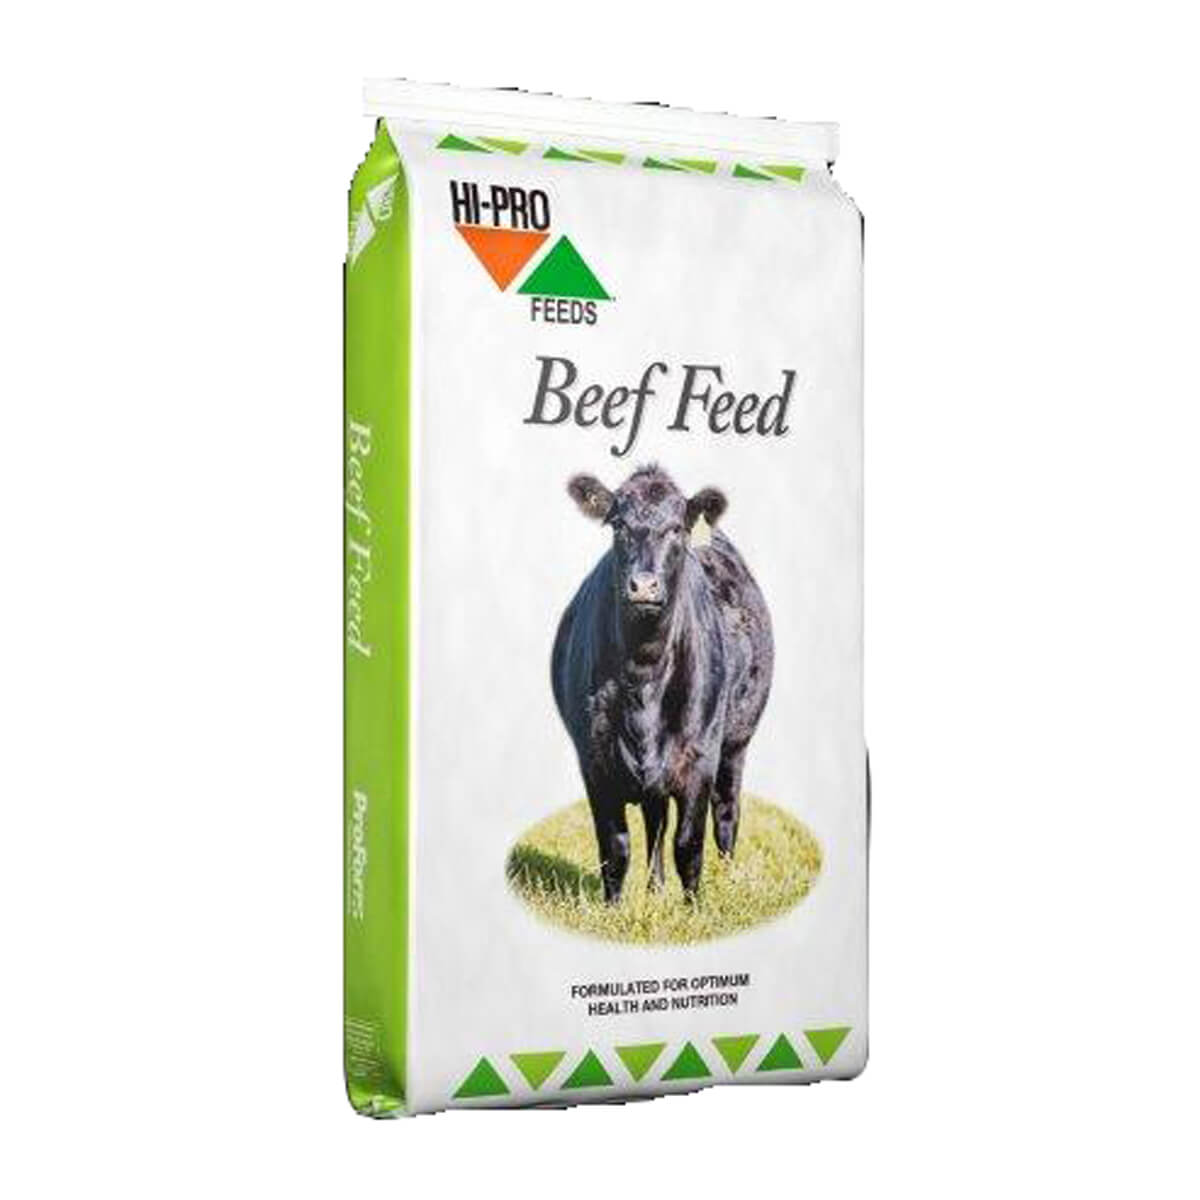 HiPro 30% Beef Supplement - 20 kg